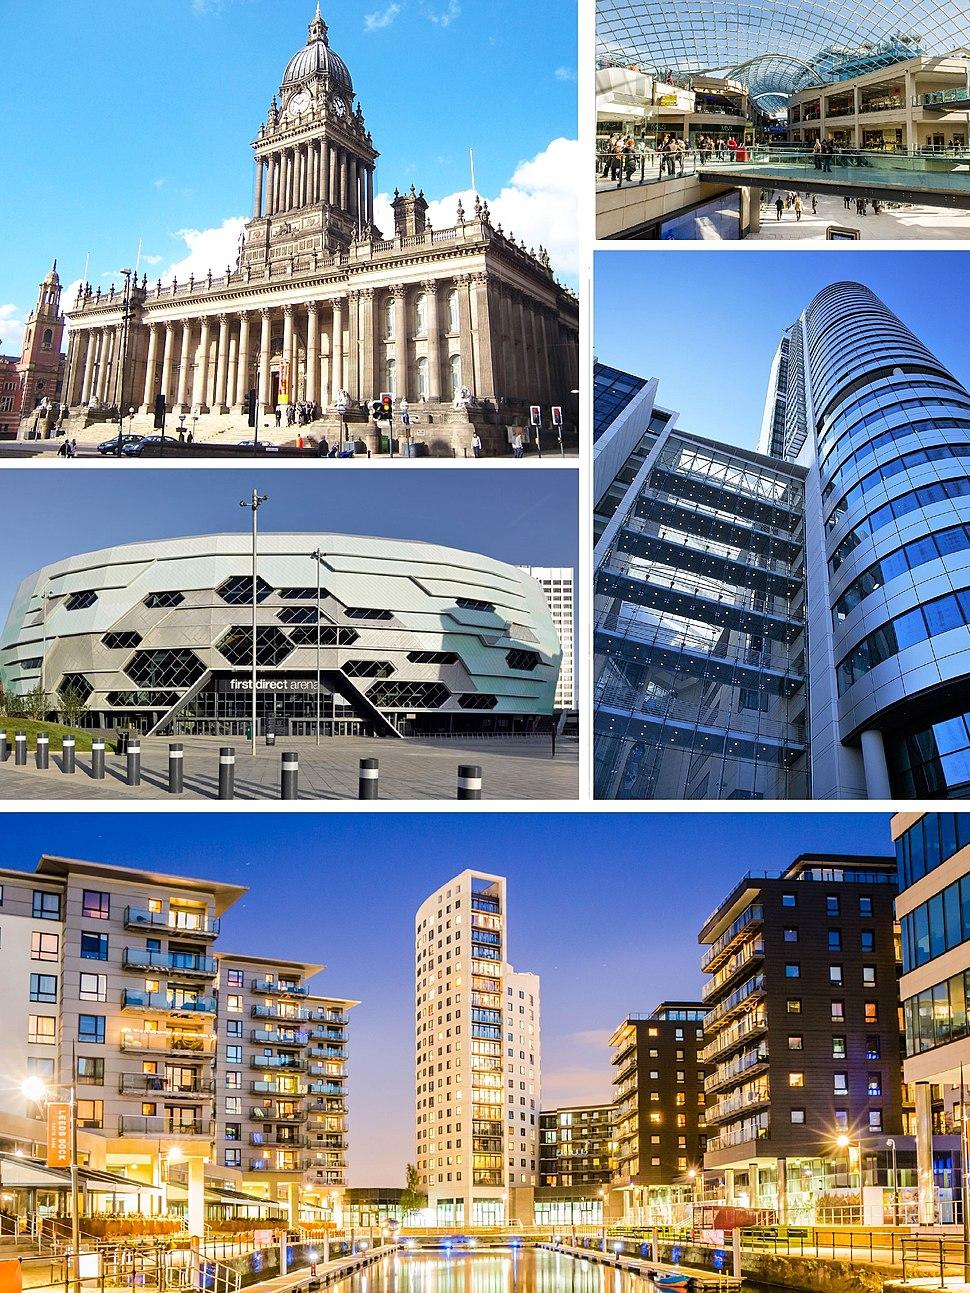 Clockwise from top left: Leeds Town Hall, Trinity Leeds, Bridgewater Place, Leeds Dock, First Direct Arena